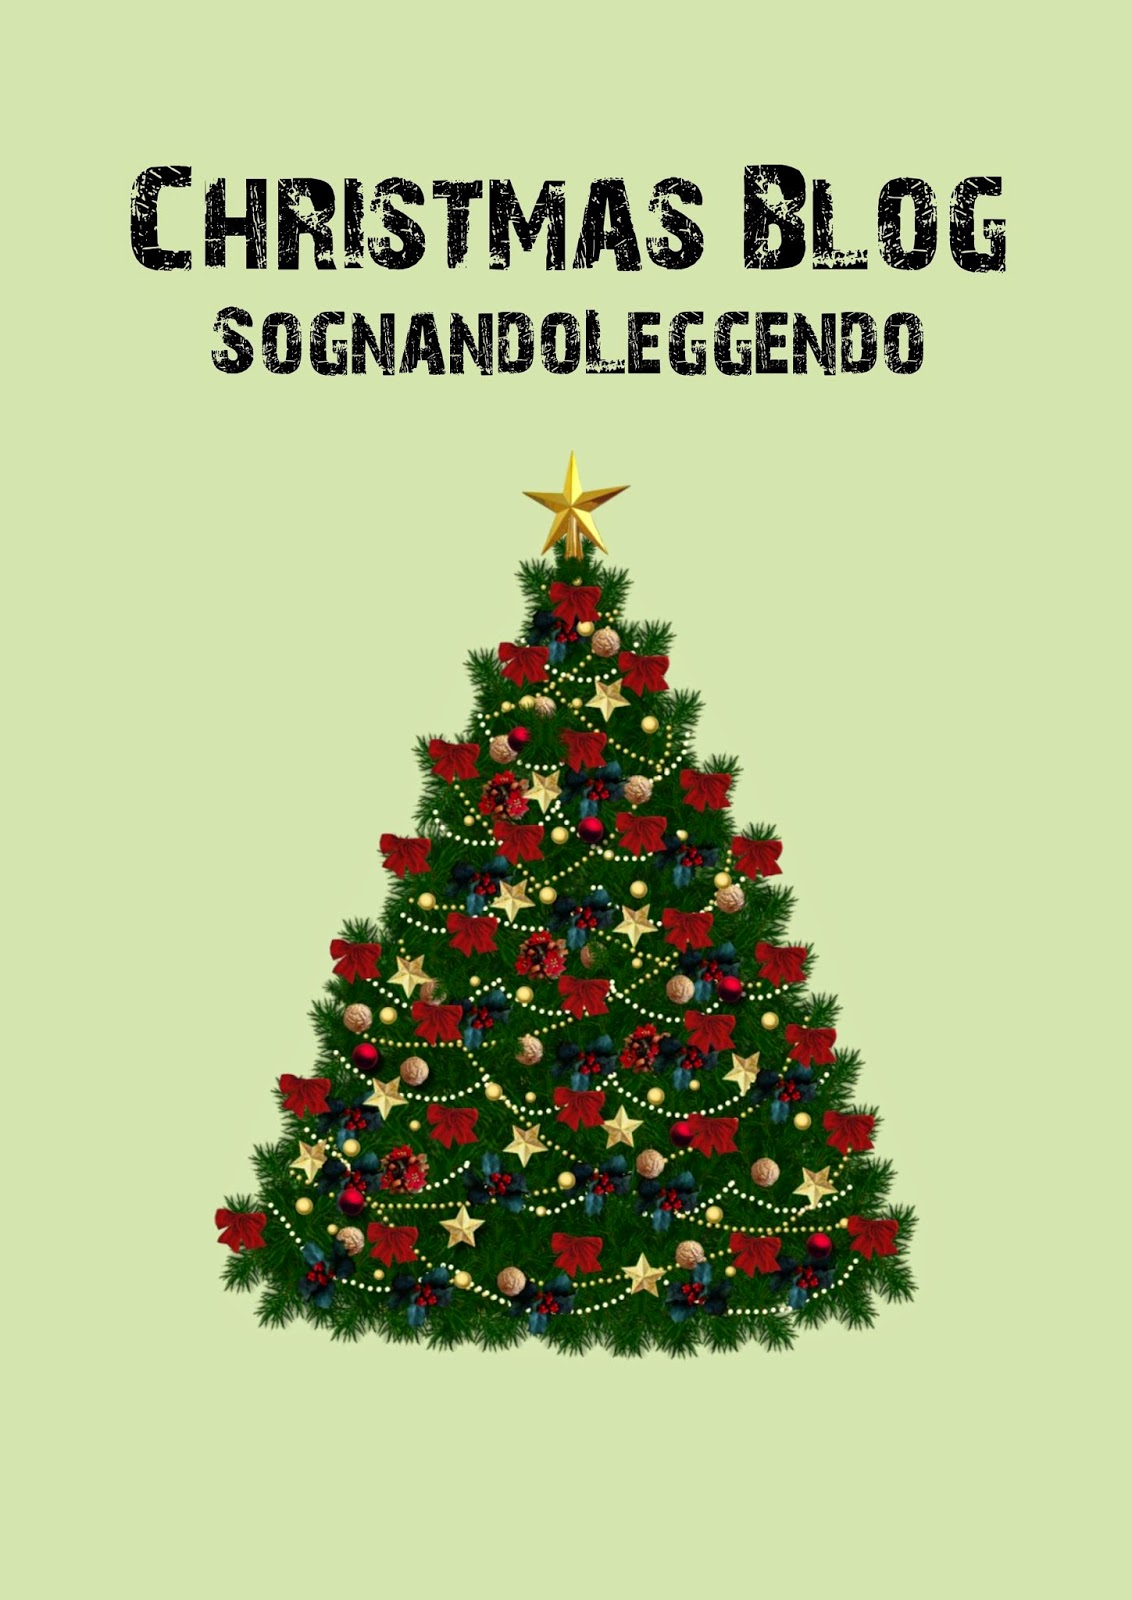 http://issuu.com/nasreen/docs/christmasblog2014